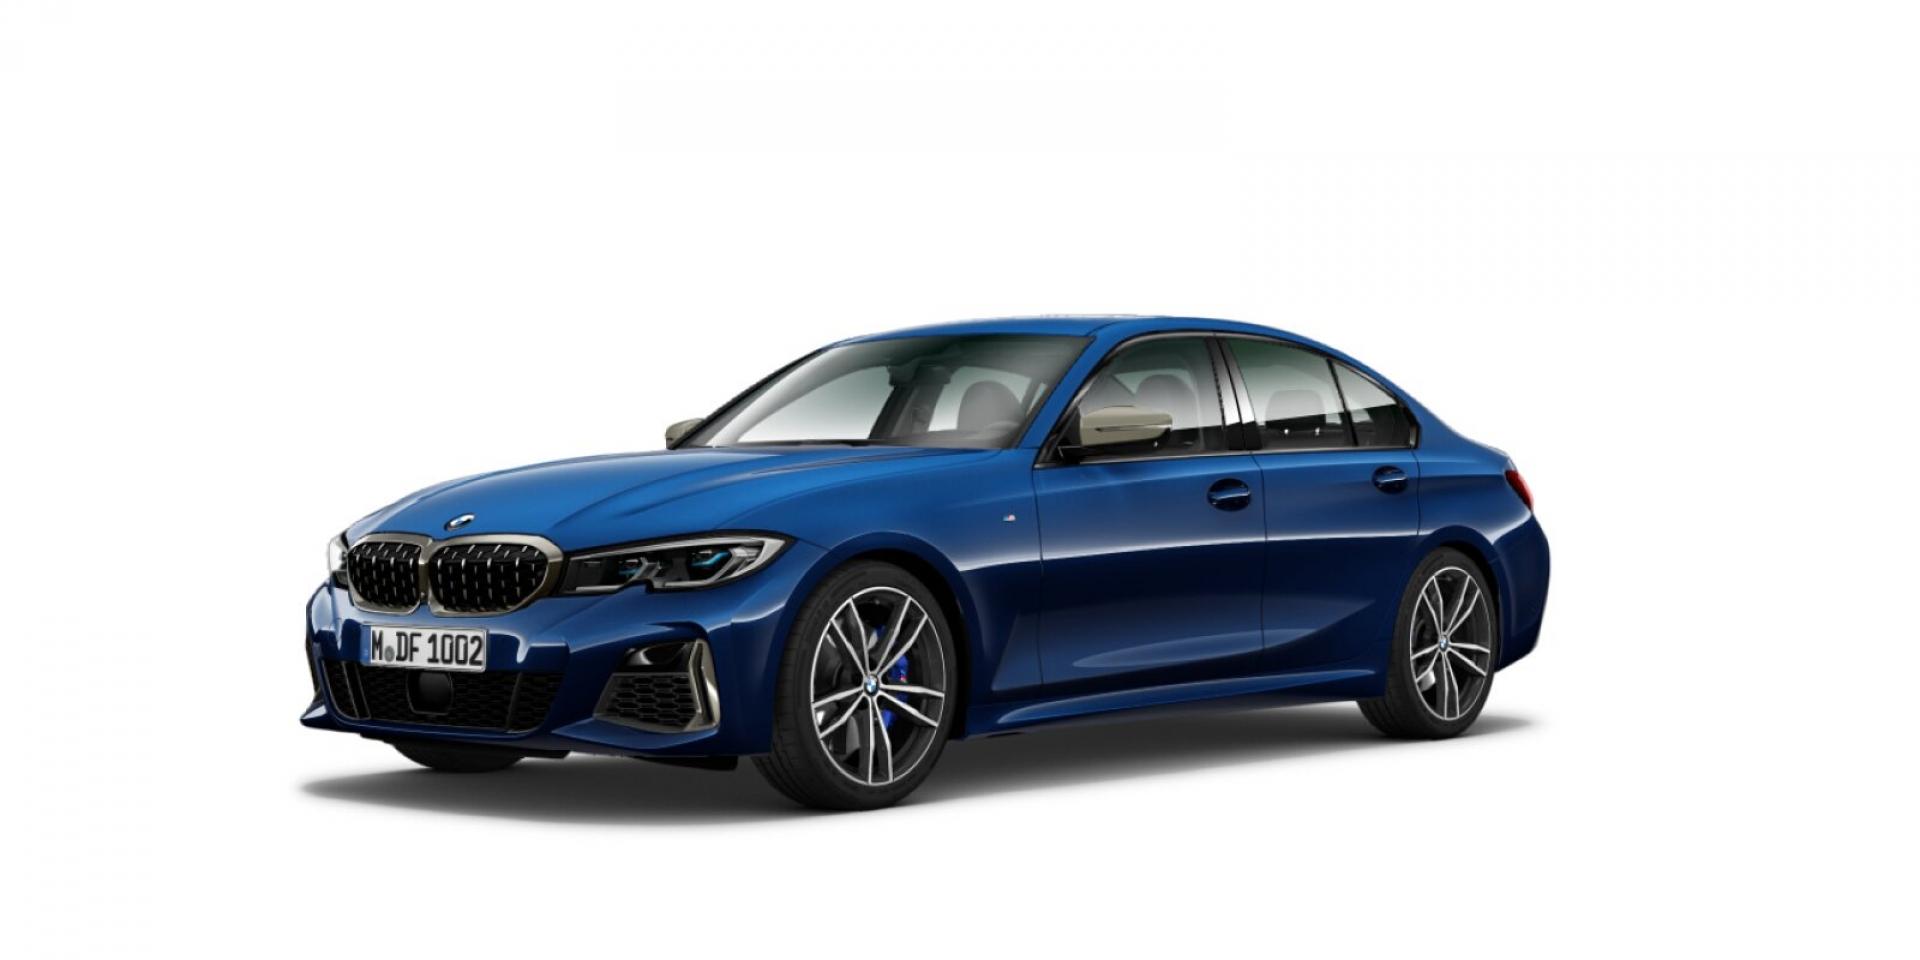 BMW G20 3系列照片曝光!取消了排檔桿的設計?